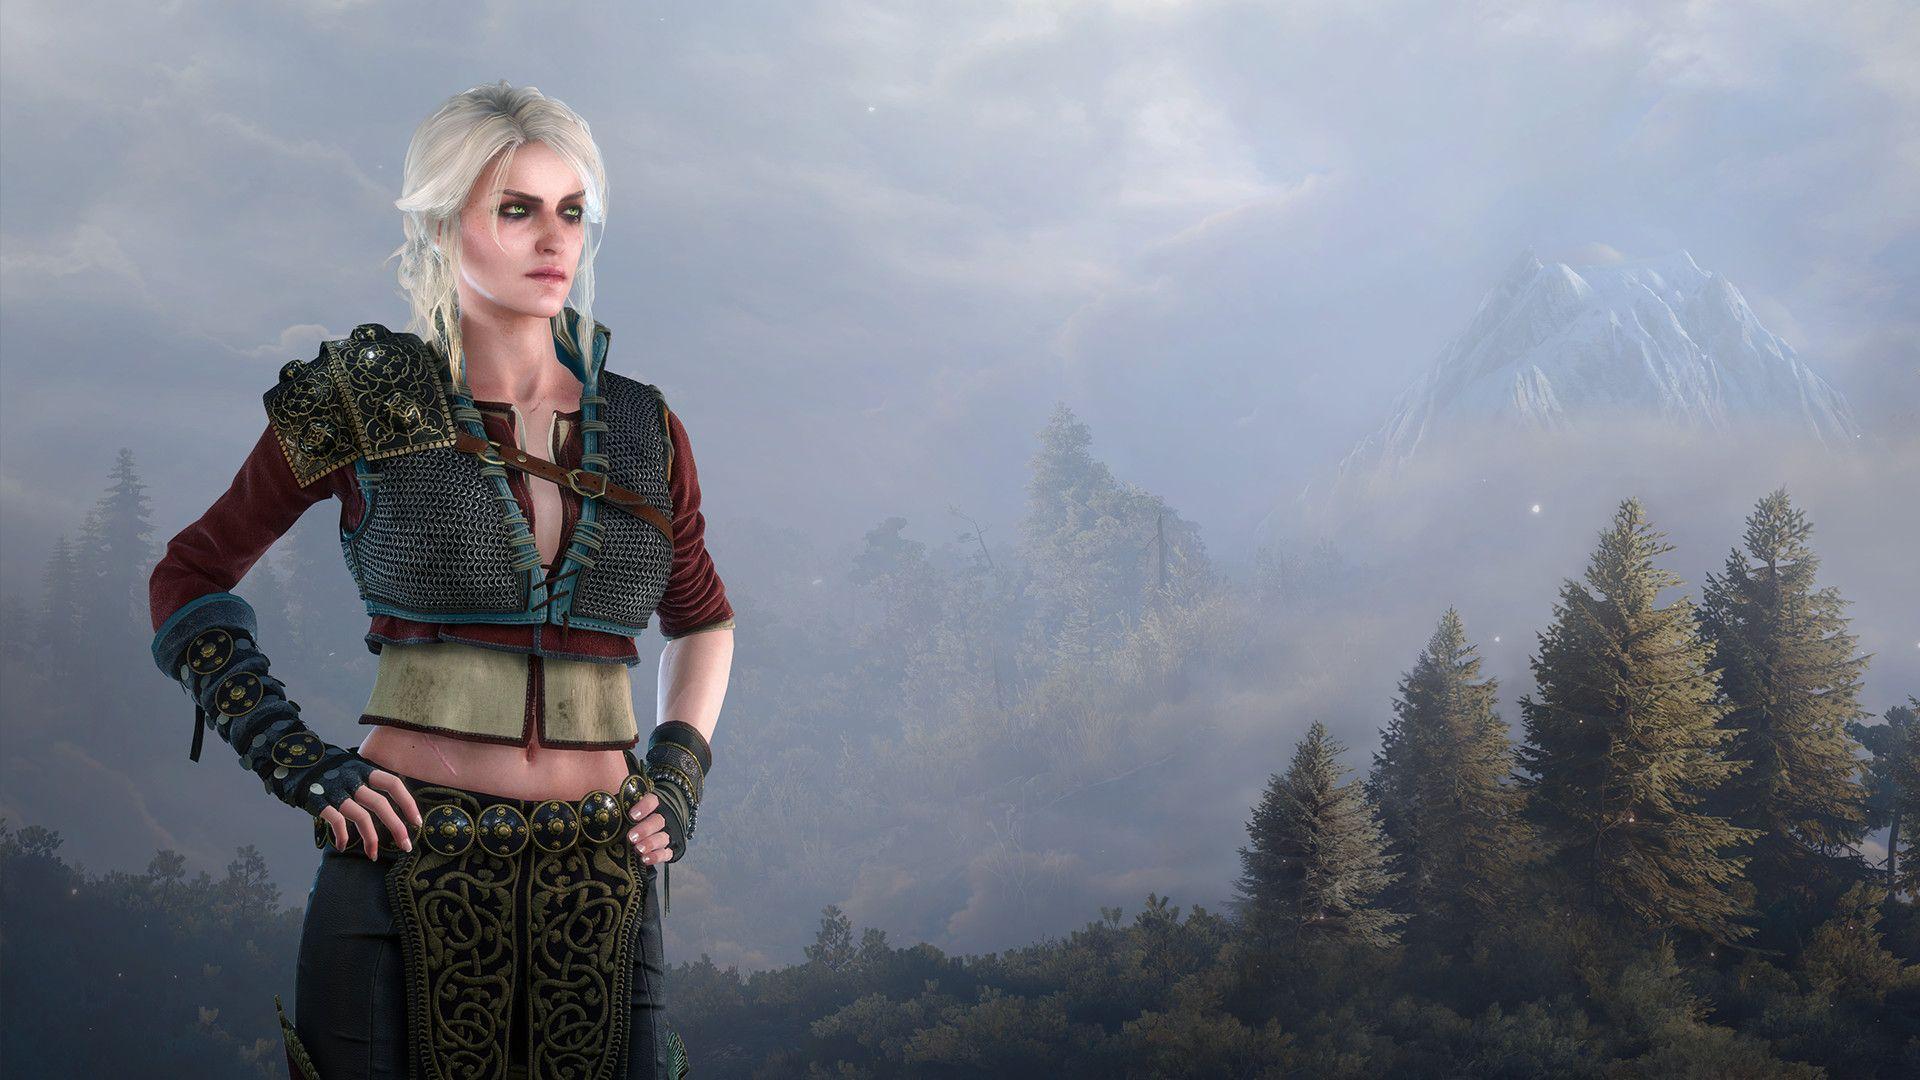 Witcher Ciri, New Wallpaper